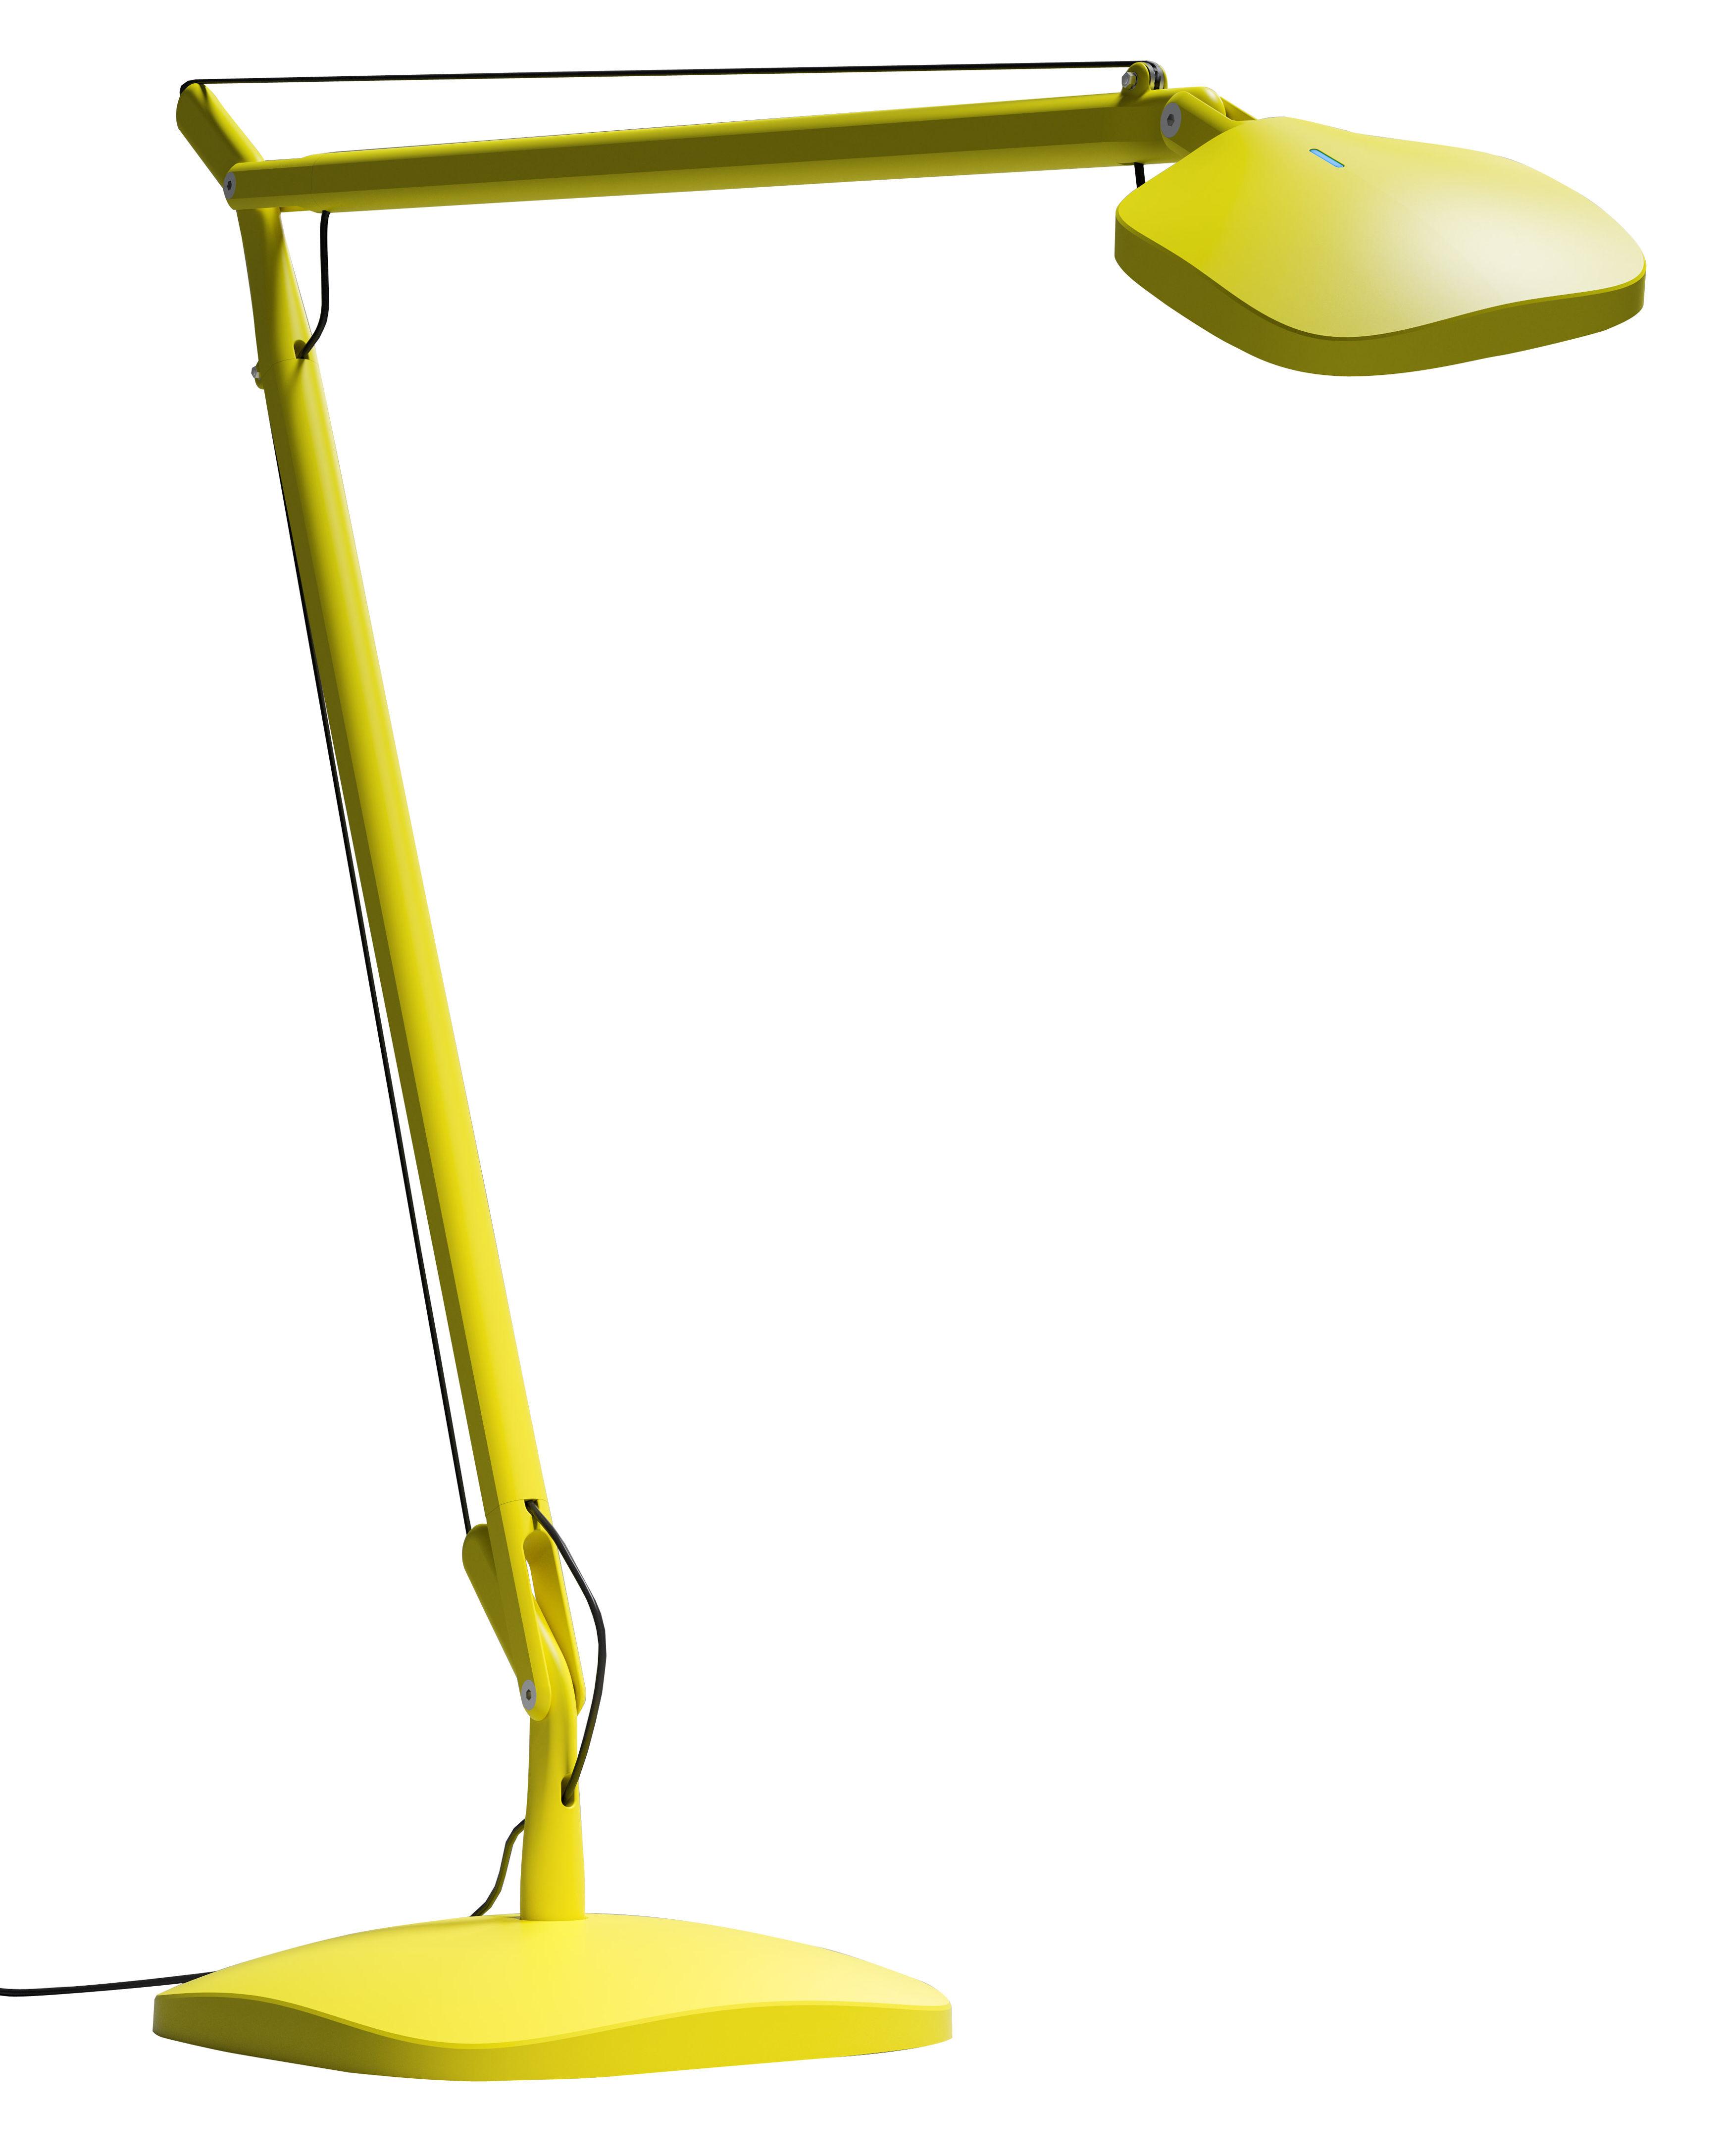 Lighting - Table Lamps - Volée LED Table lamp by Fontana Arte - Yellow - Aluminium